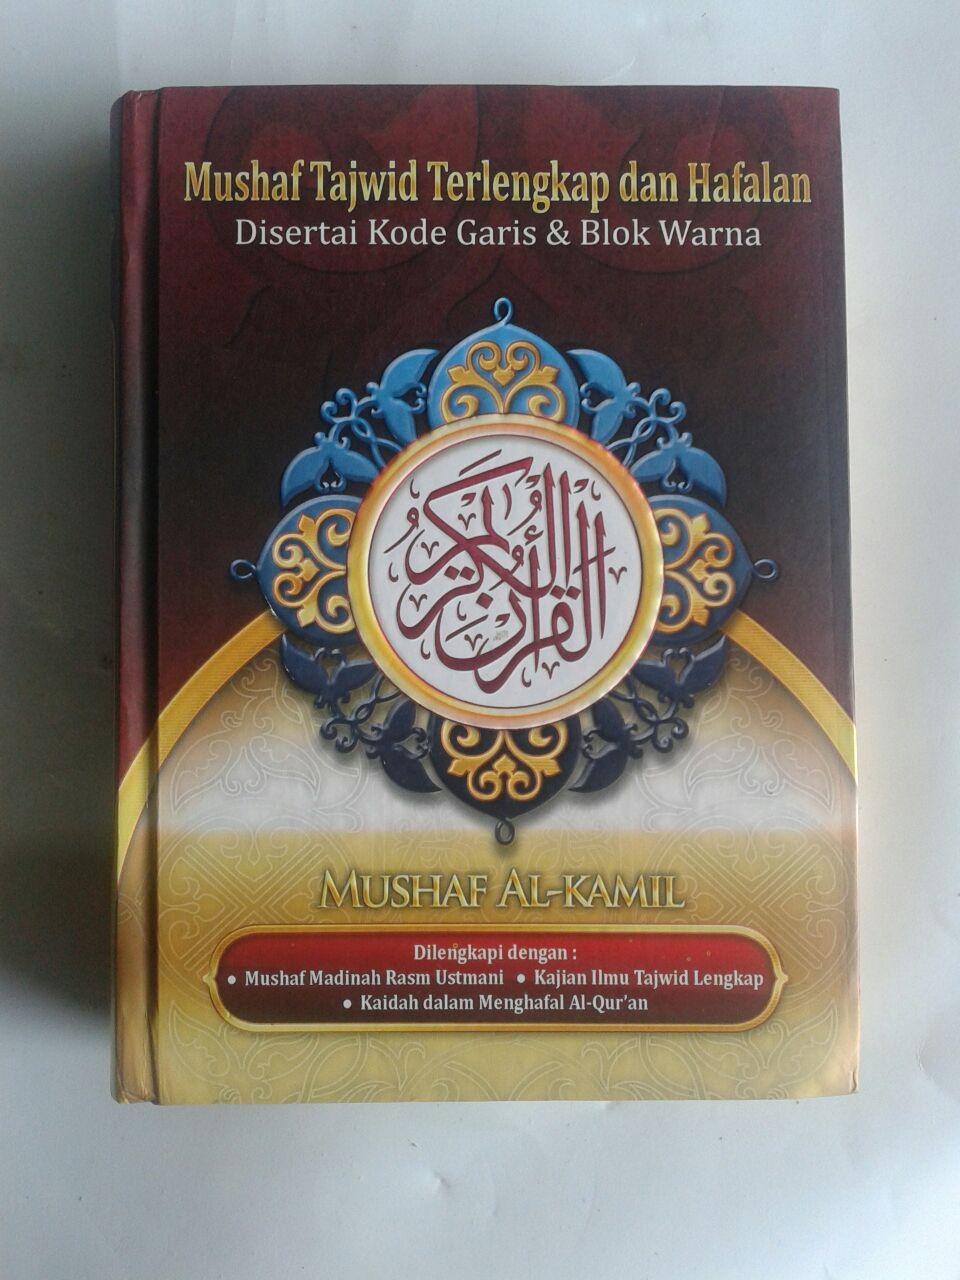 Al-Qur'an Mushaf Tajwid Terlengkap dan Hafalan cover